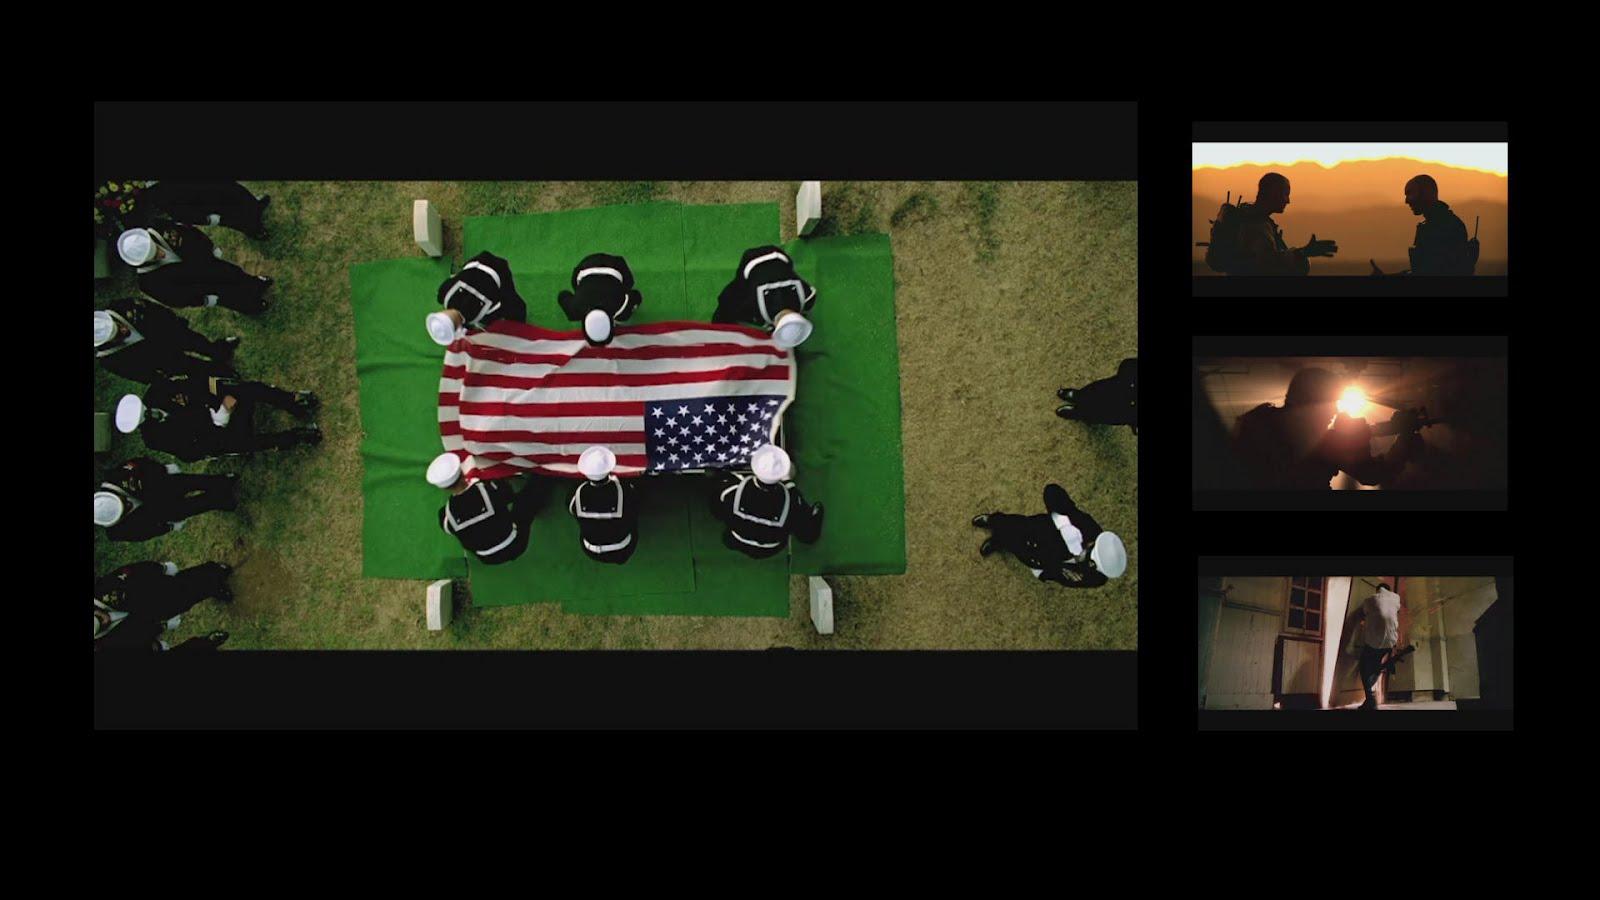 Act of Valor wallpaper : actual Navy SEALs | MoovieWatch!